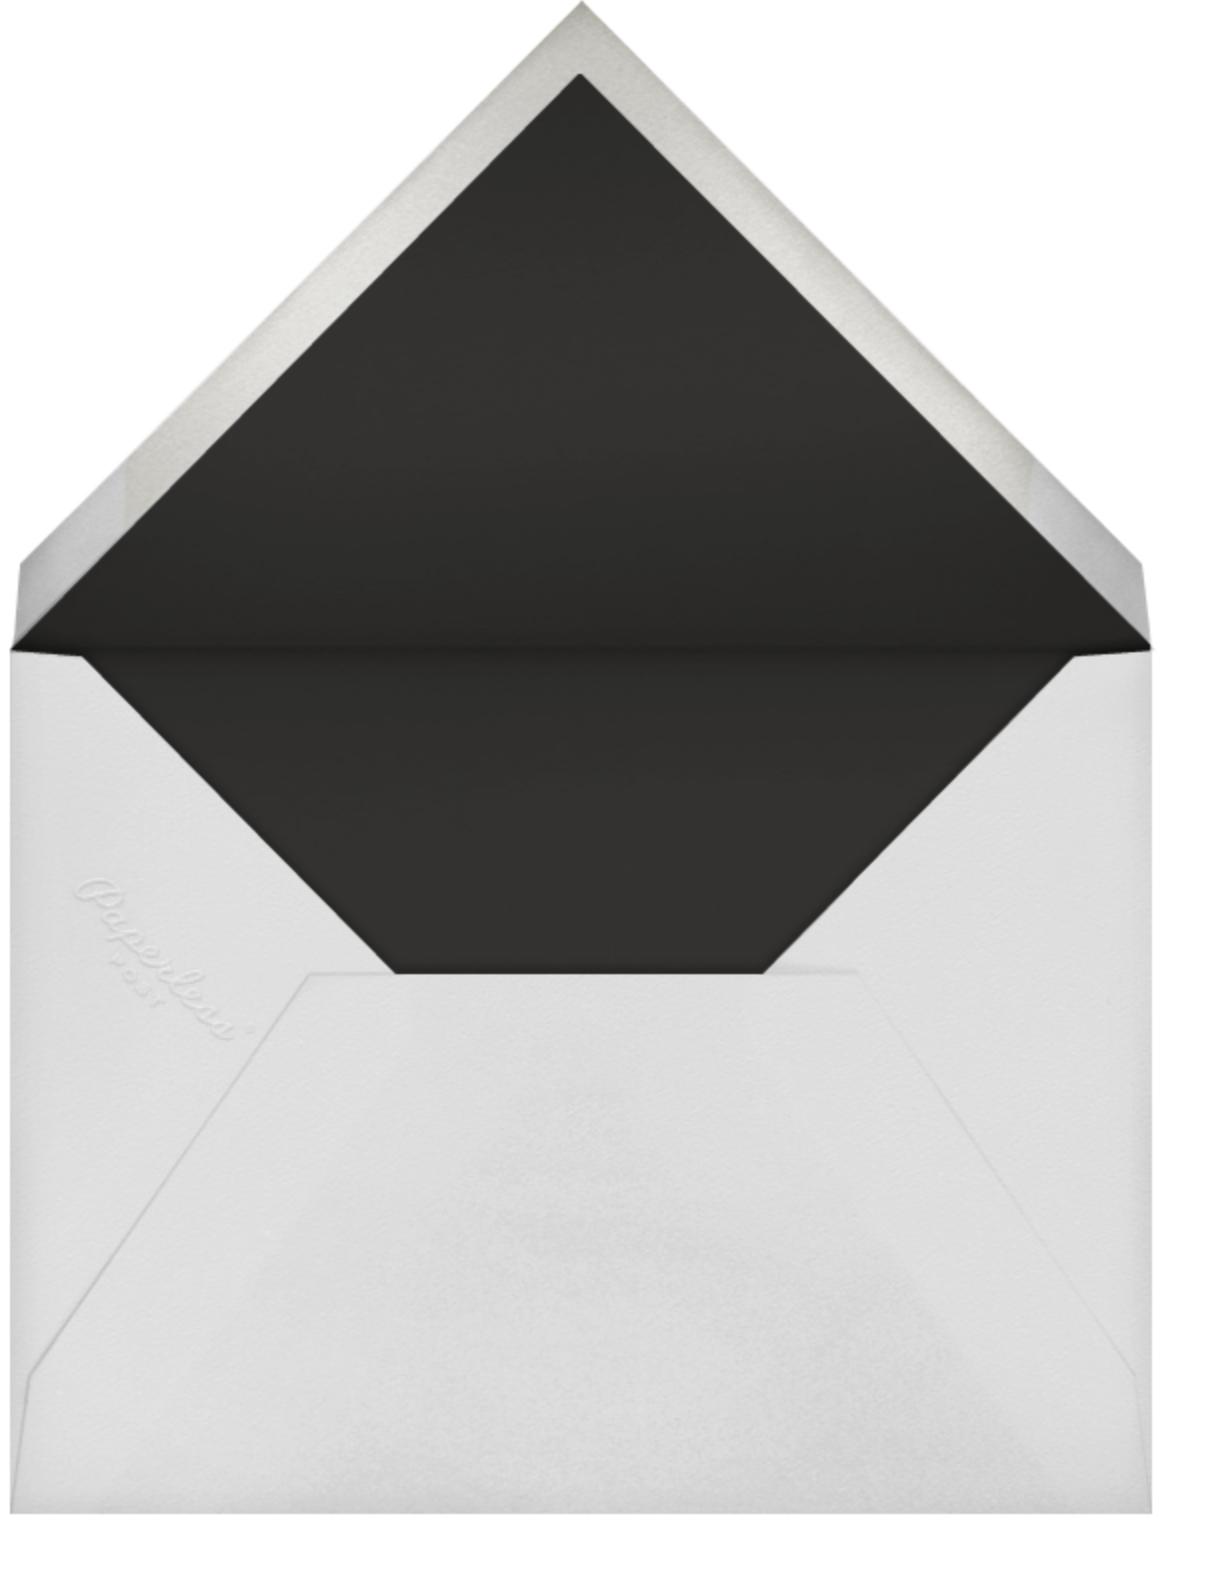 Floral Trellis II (Photo Save the Date) - White/Silver - Oscar de la Renta - Photo  - envelope back